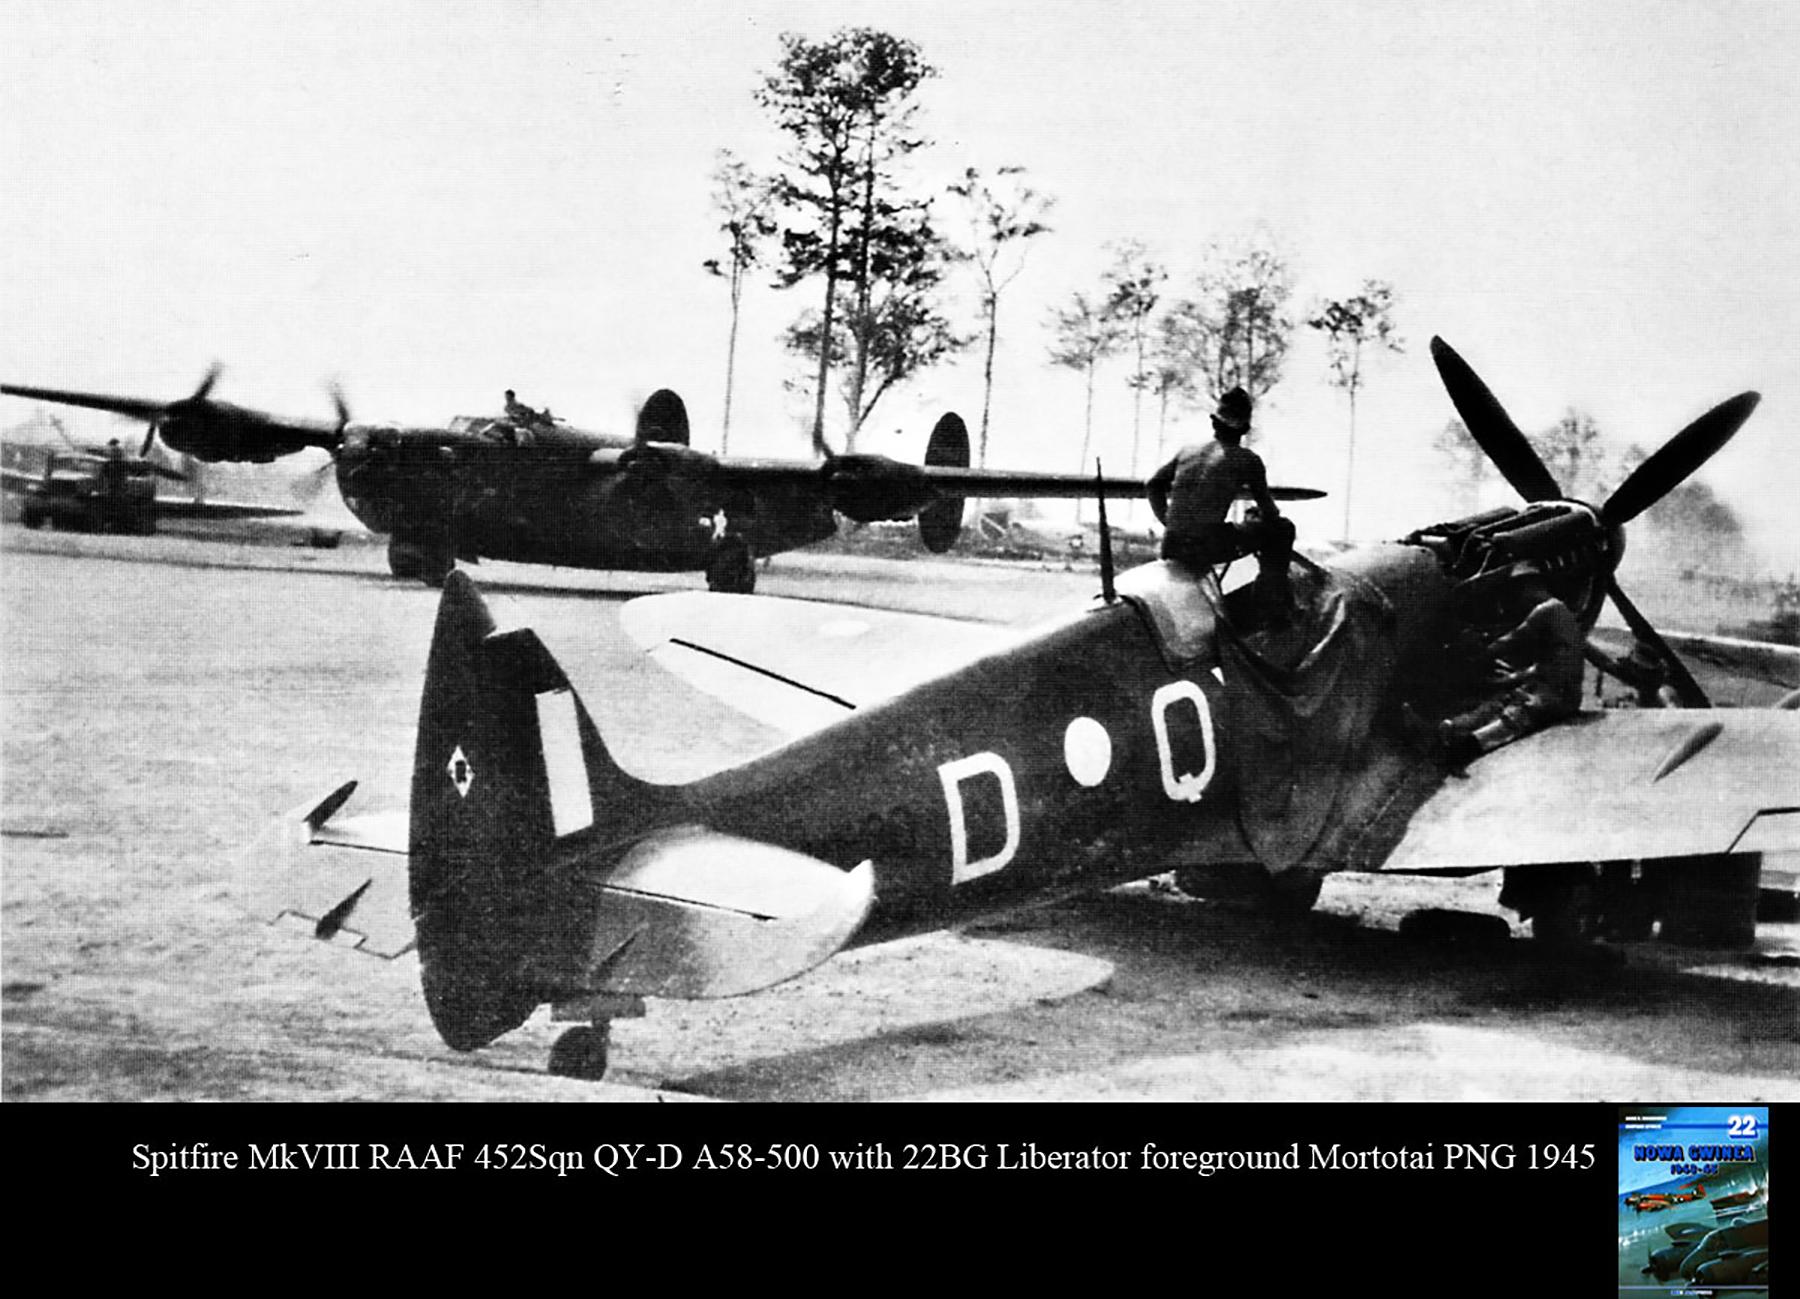 Spitfire MkVIII RAAF 452Sqn QYD A58 500 with 22BG Liberator foreground Mortotai PNG 1945